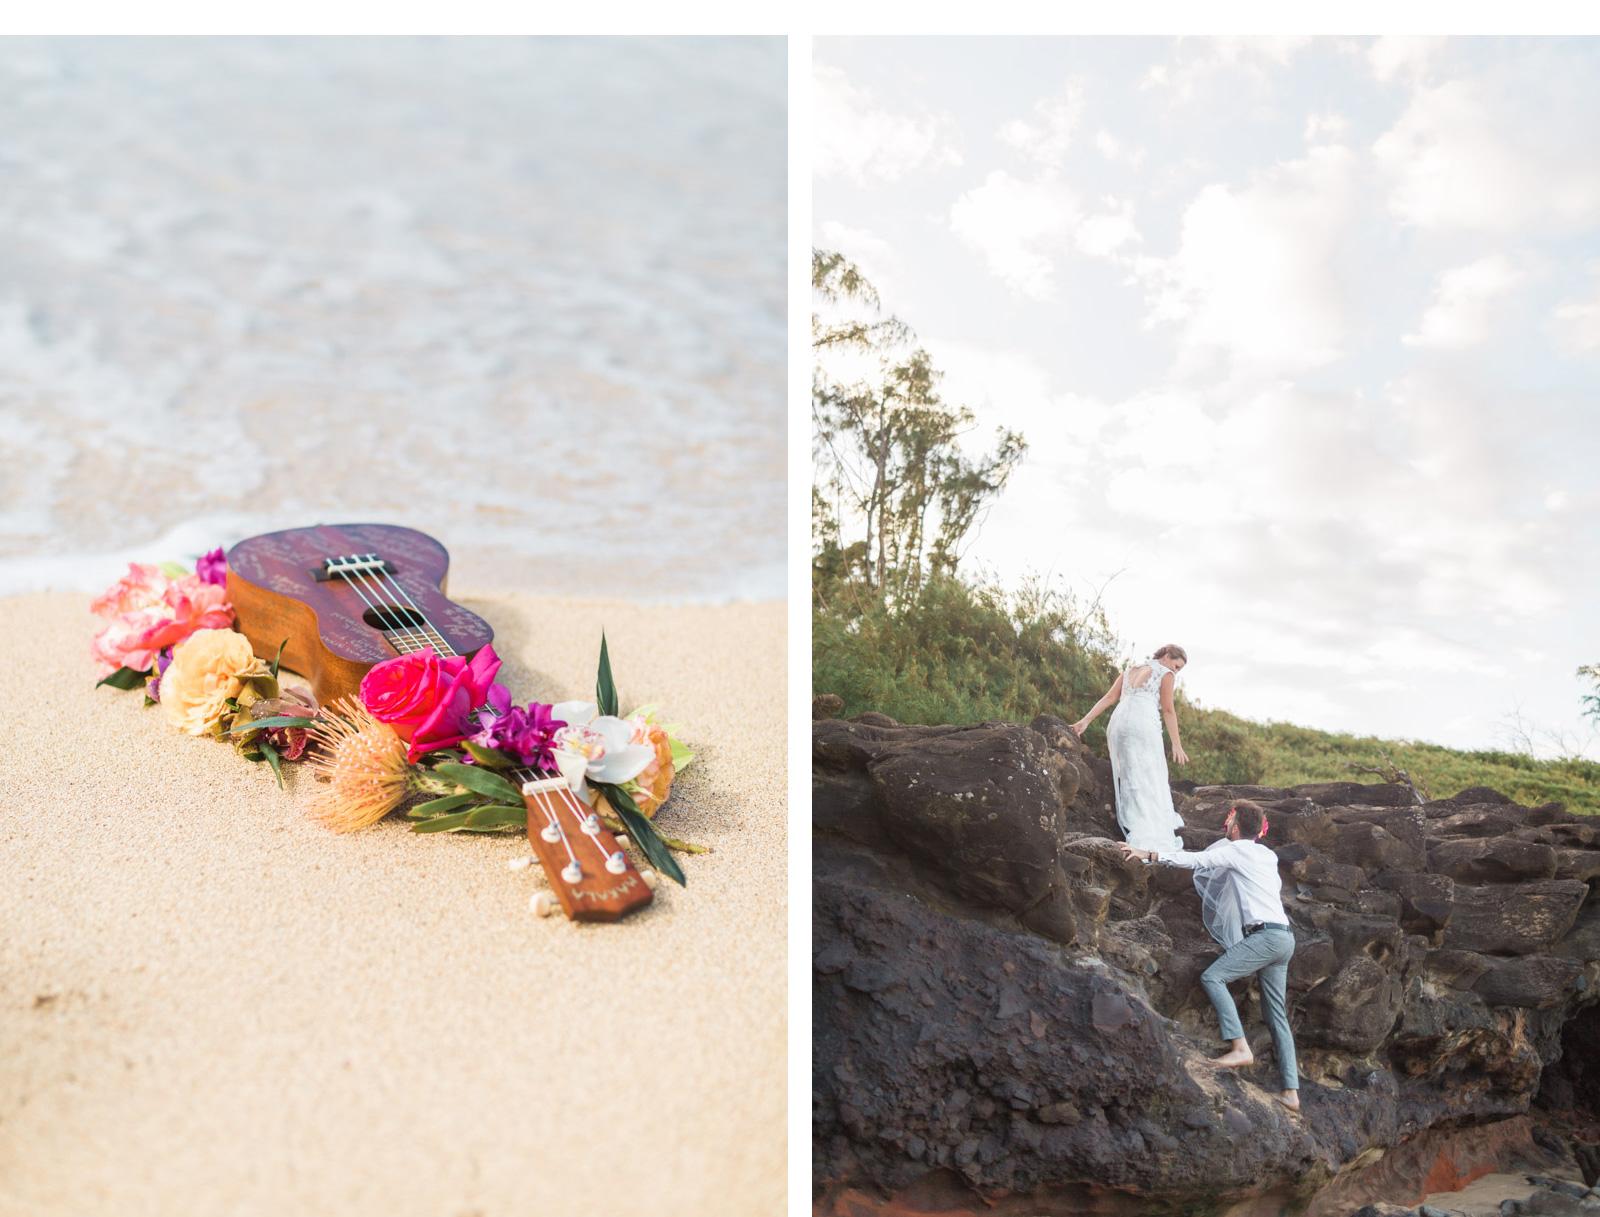 Natalie-Schutt-Photography---Southern-California-Wedding-Photographer_04.jpg